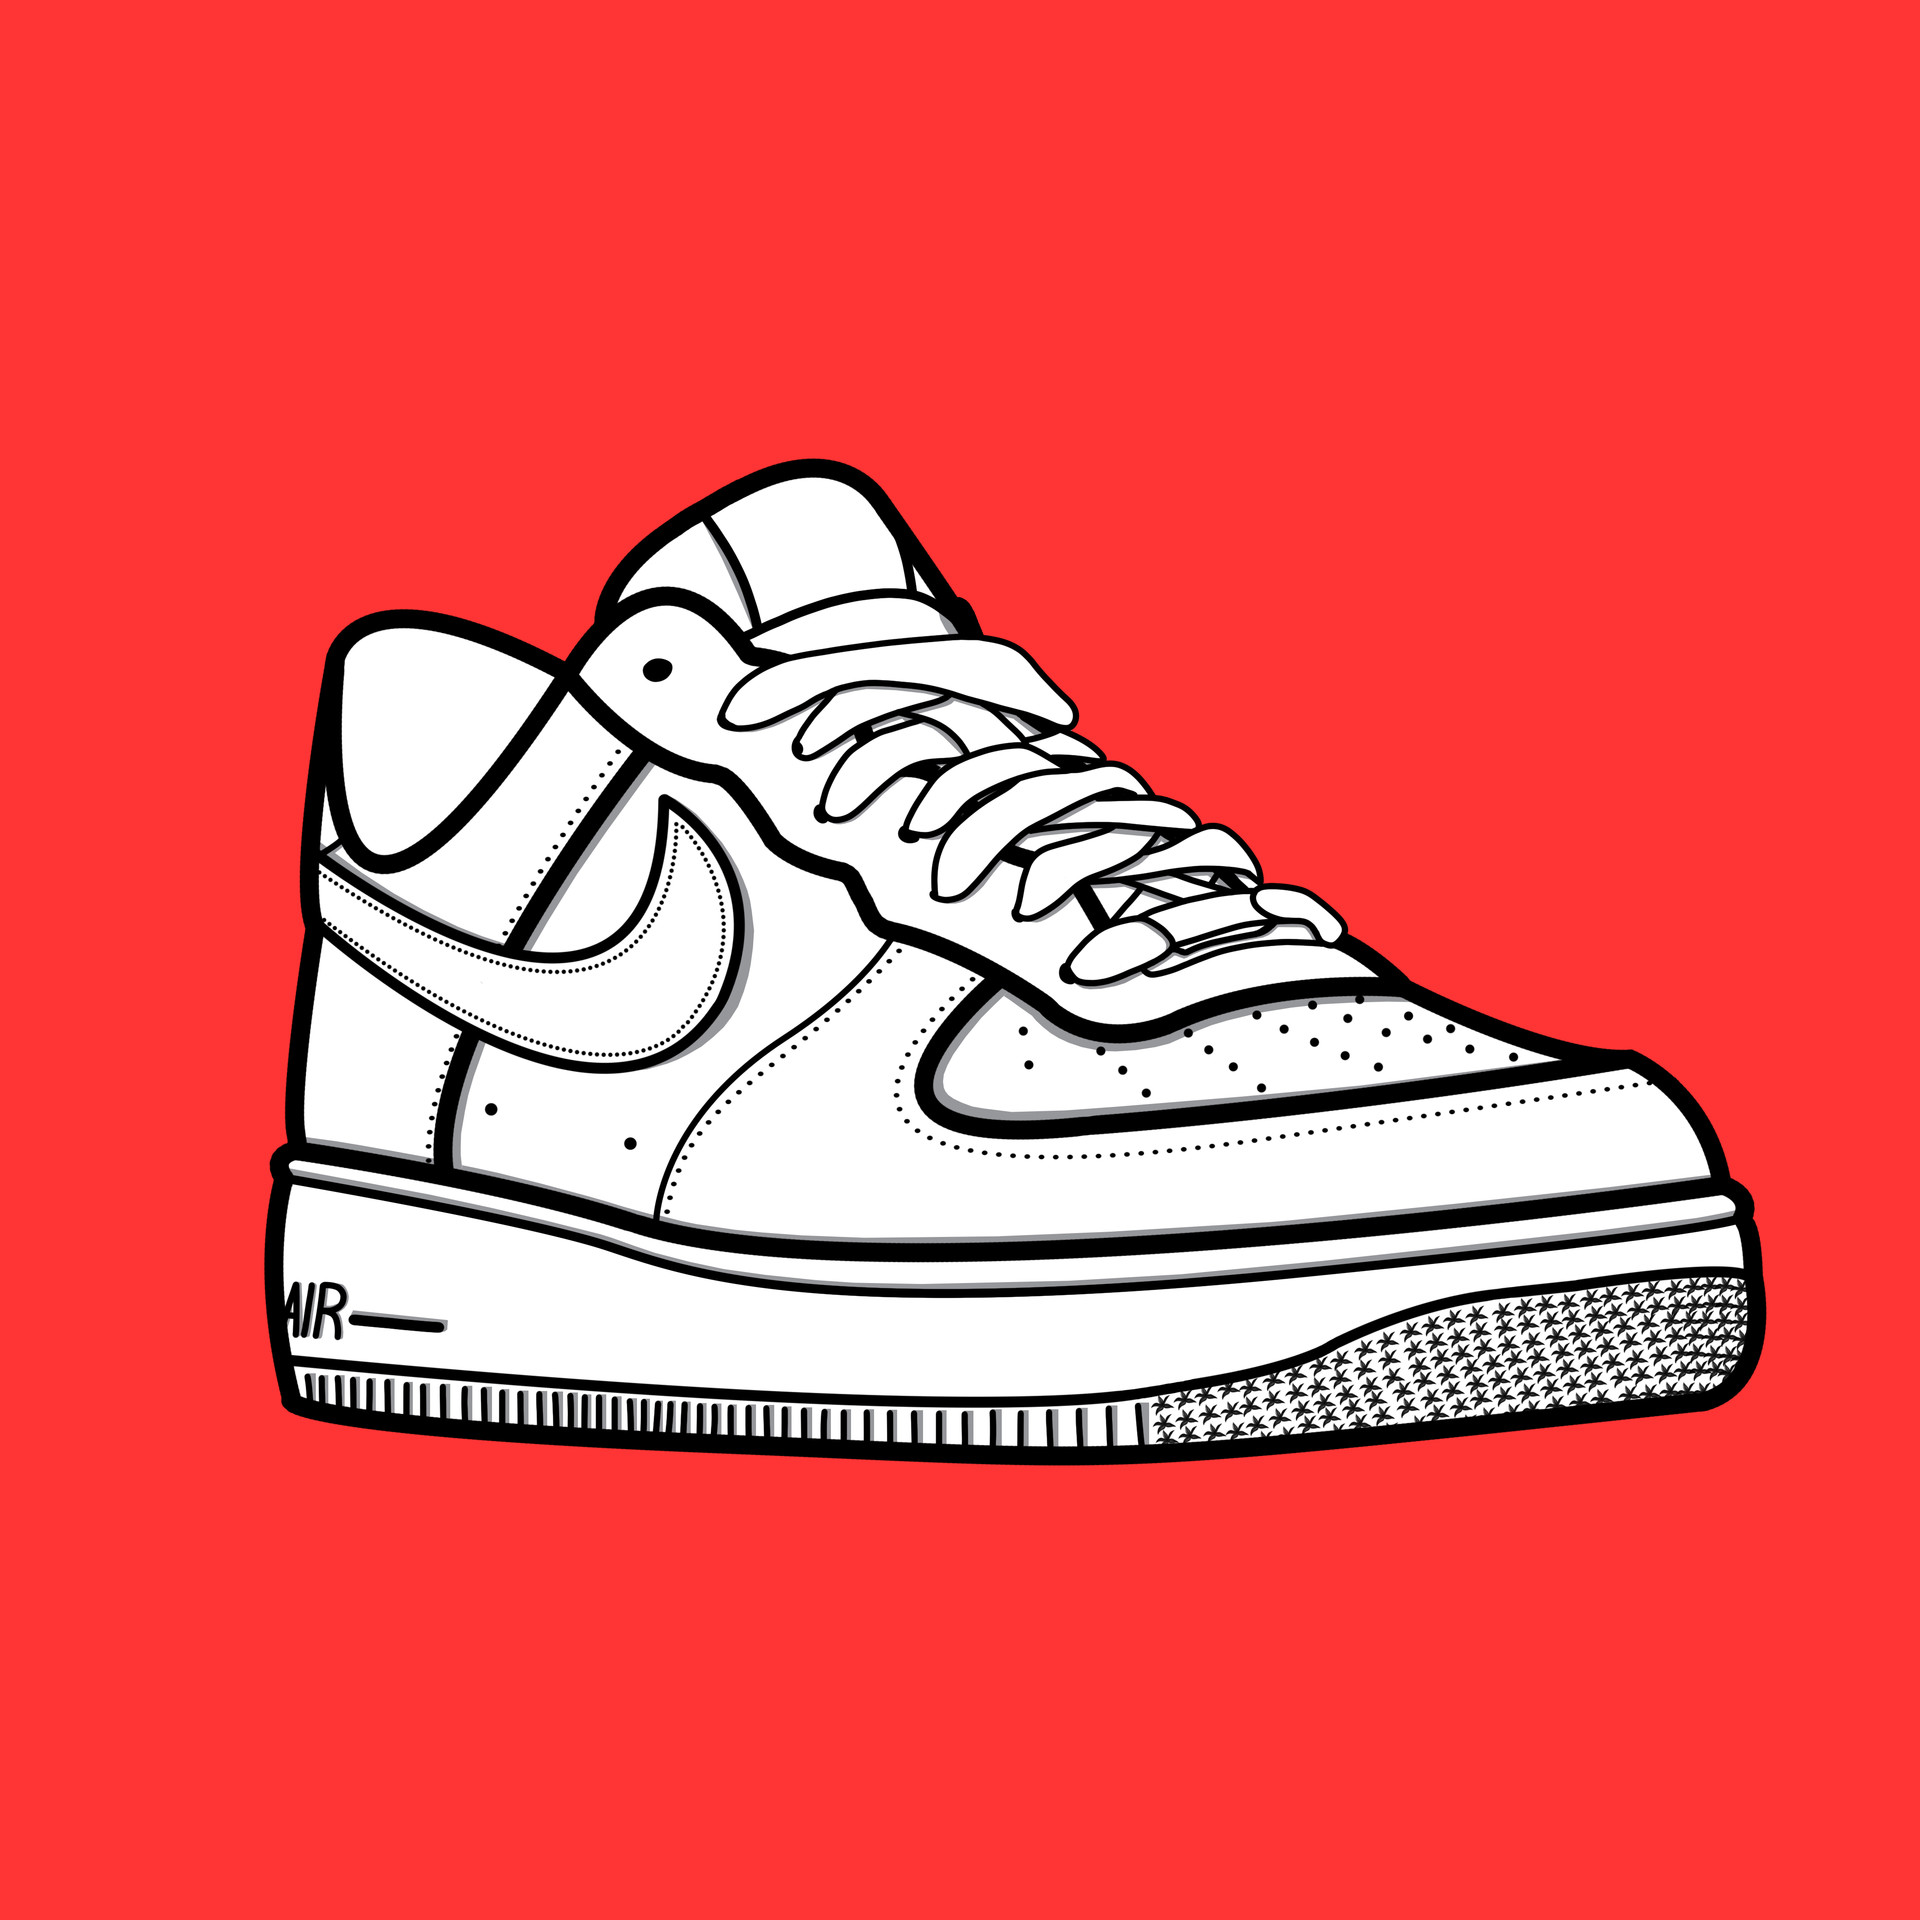 Falange vestíbulo Evaporar  chris plantinga - Nike Air Force 1